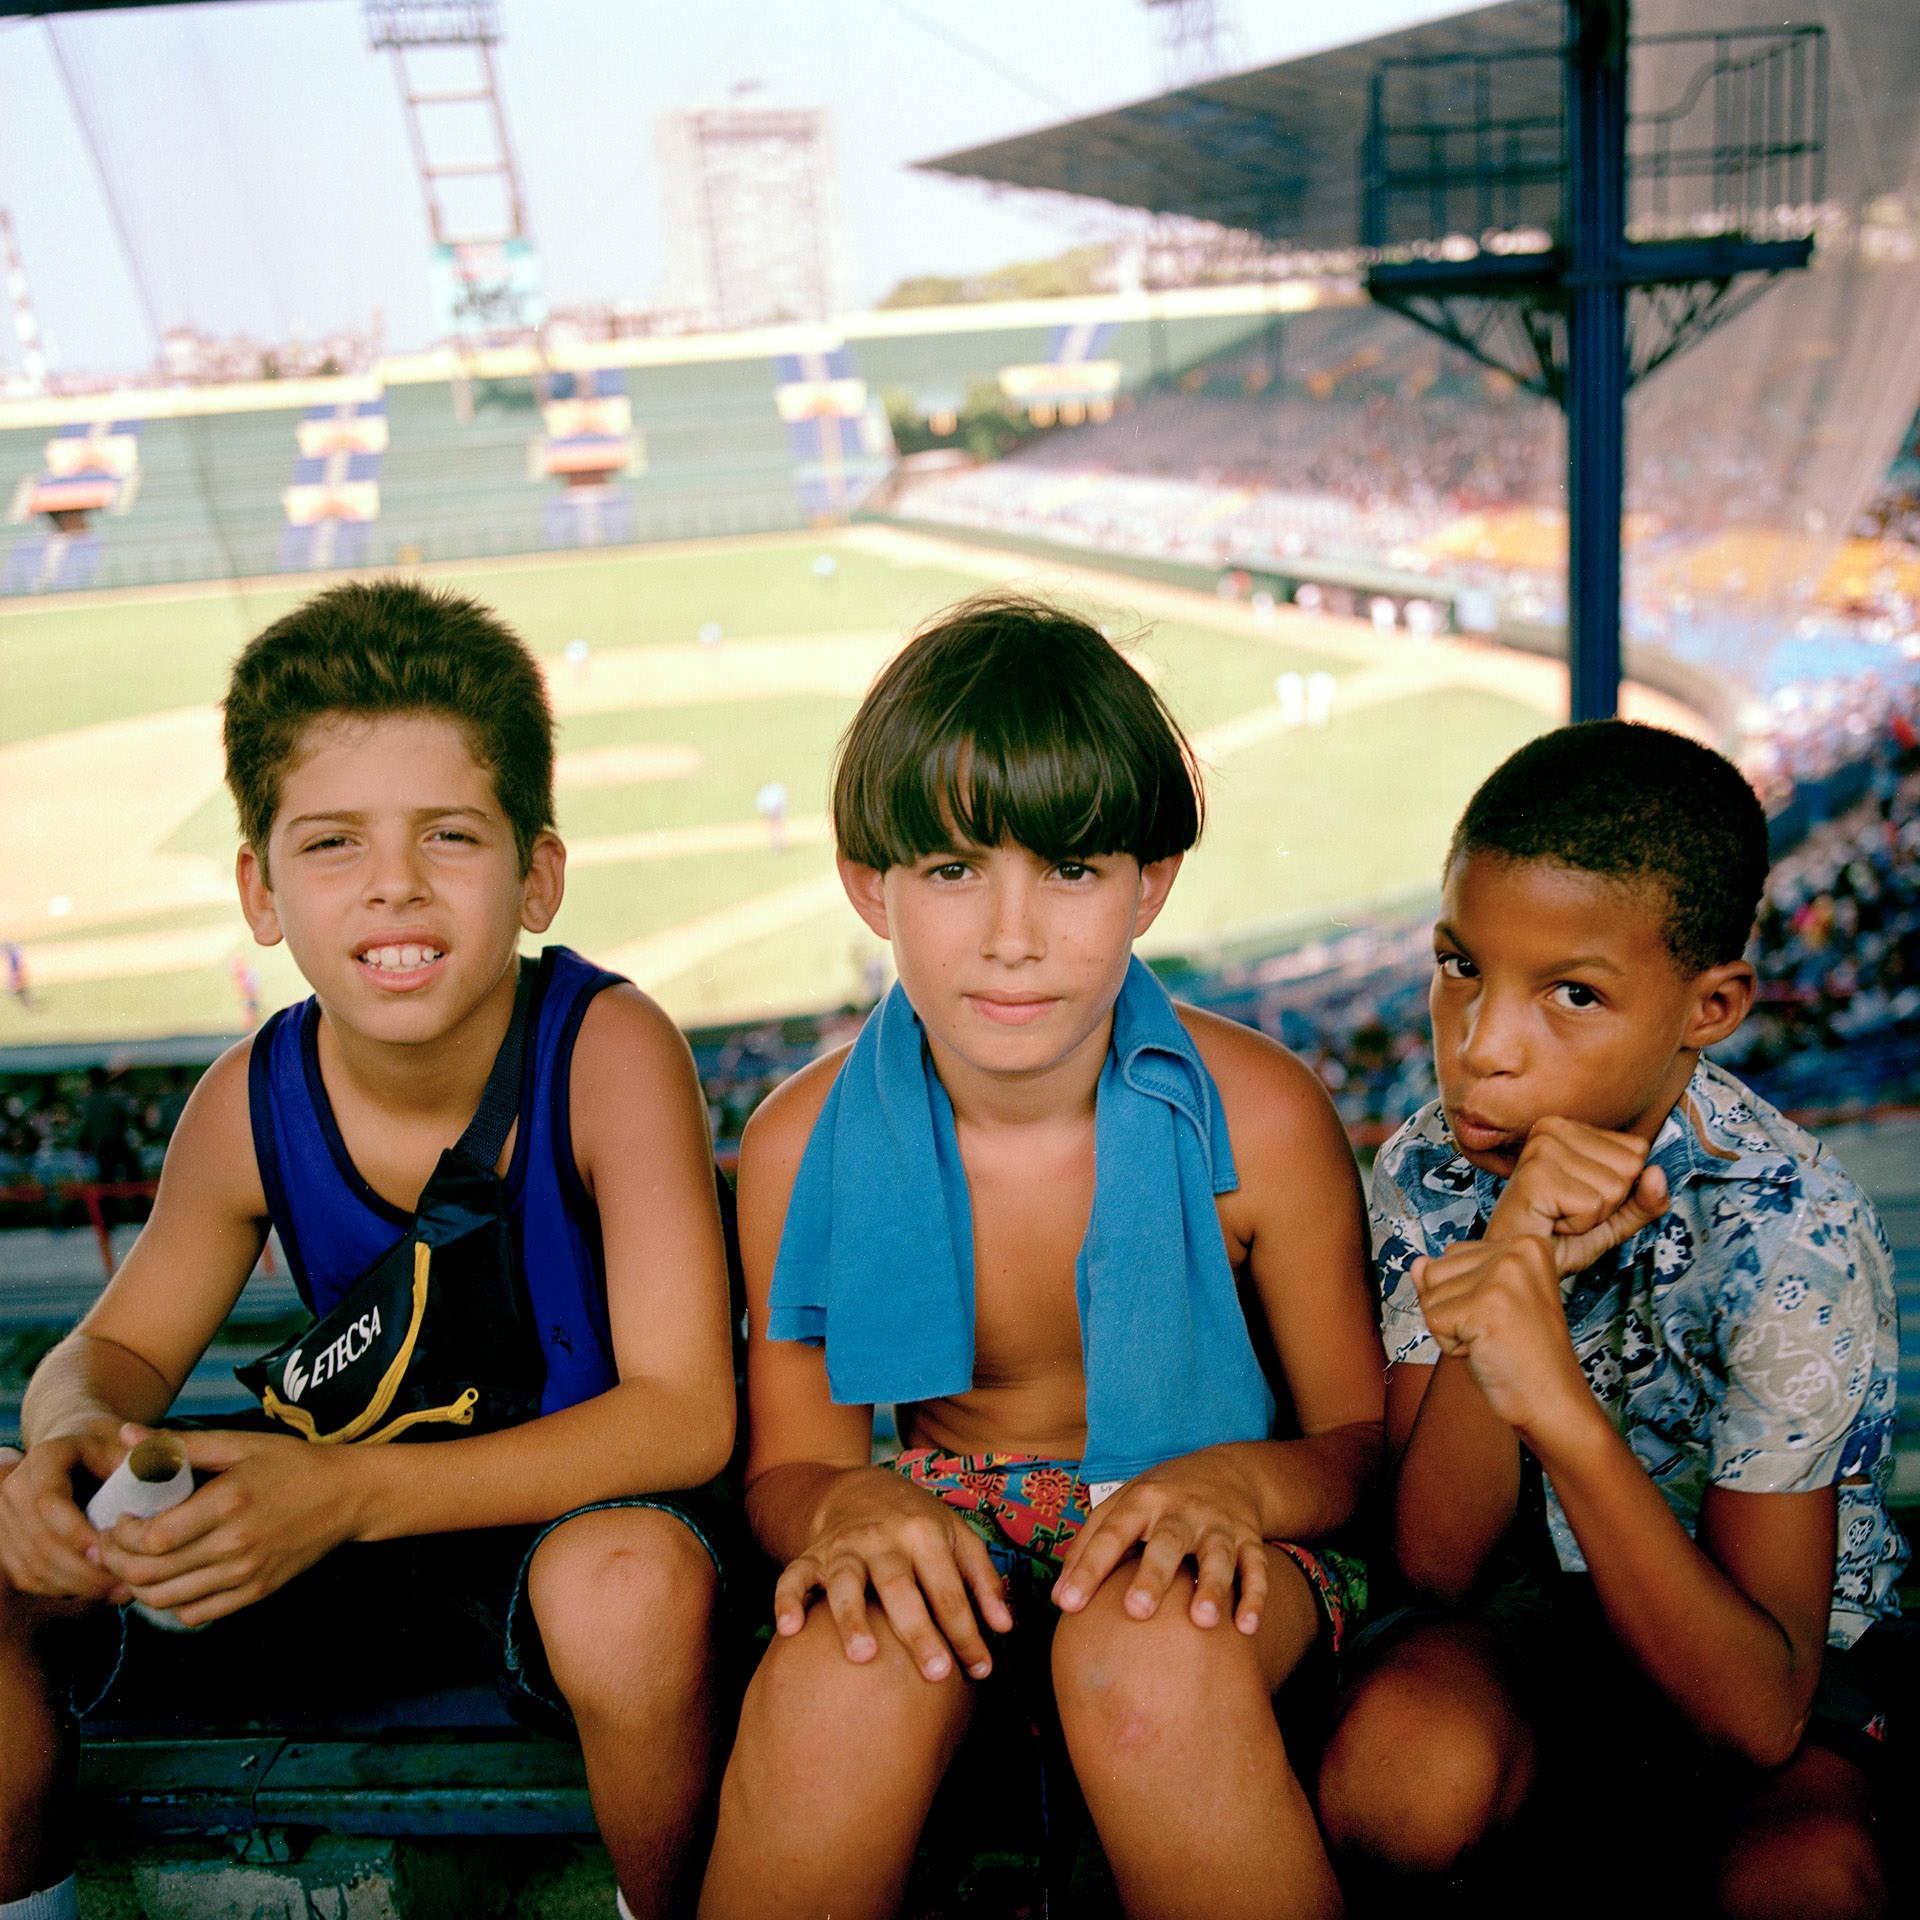 9.Baseball kids